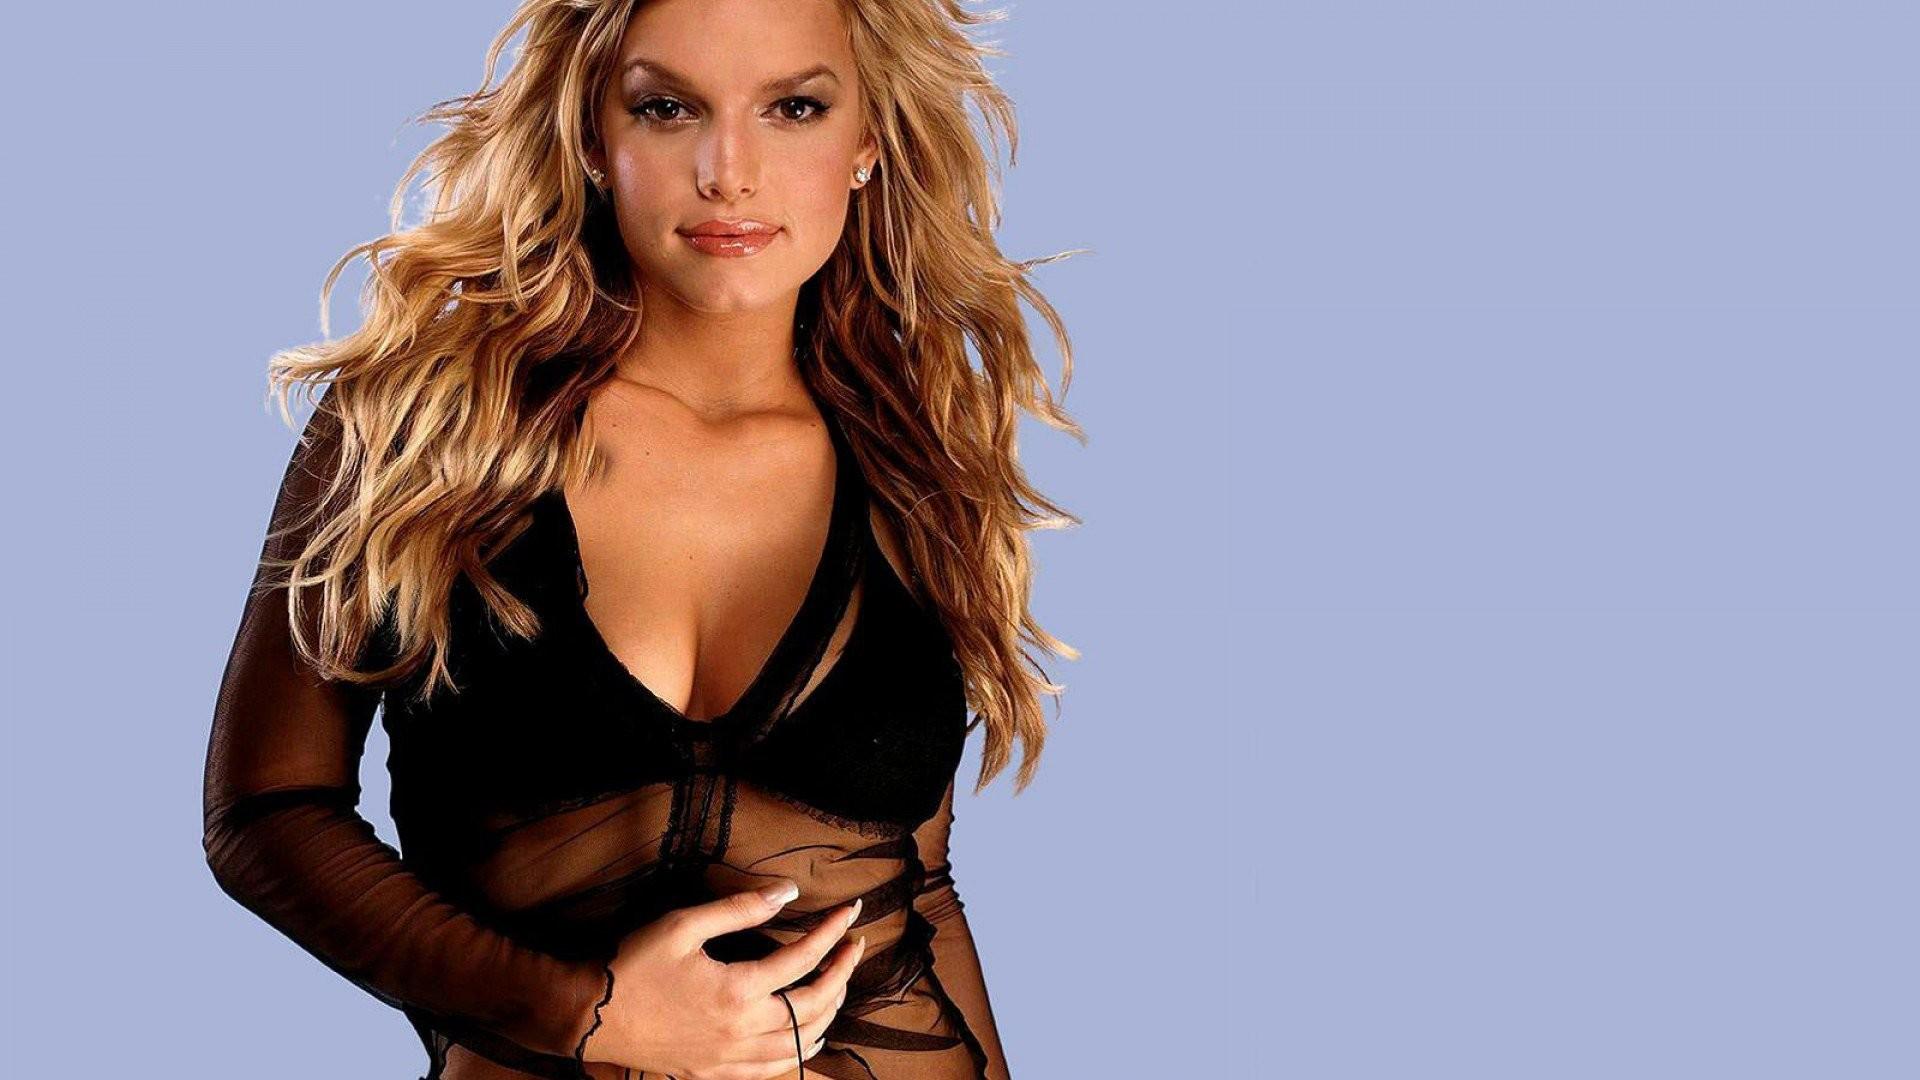 Celebrity 430870. SHARE. TAGS: Female Celebrities Jessica Simpson Celebrity